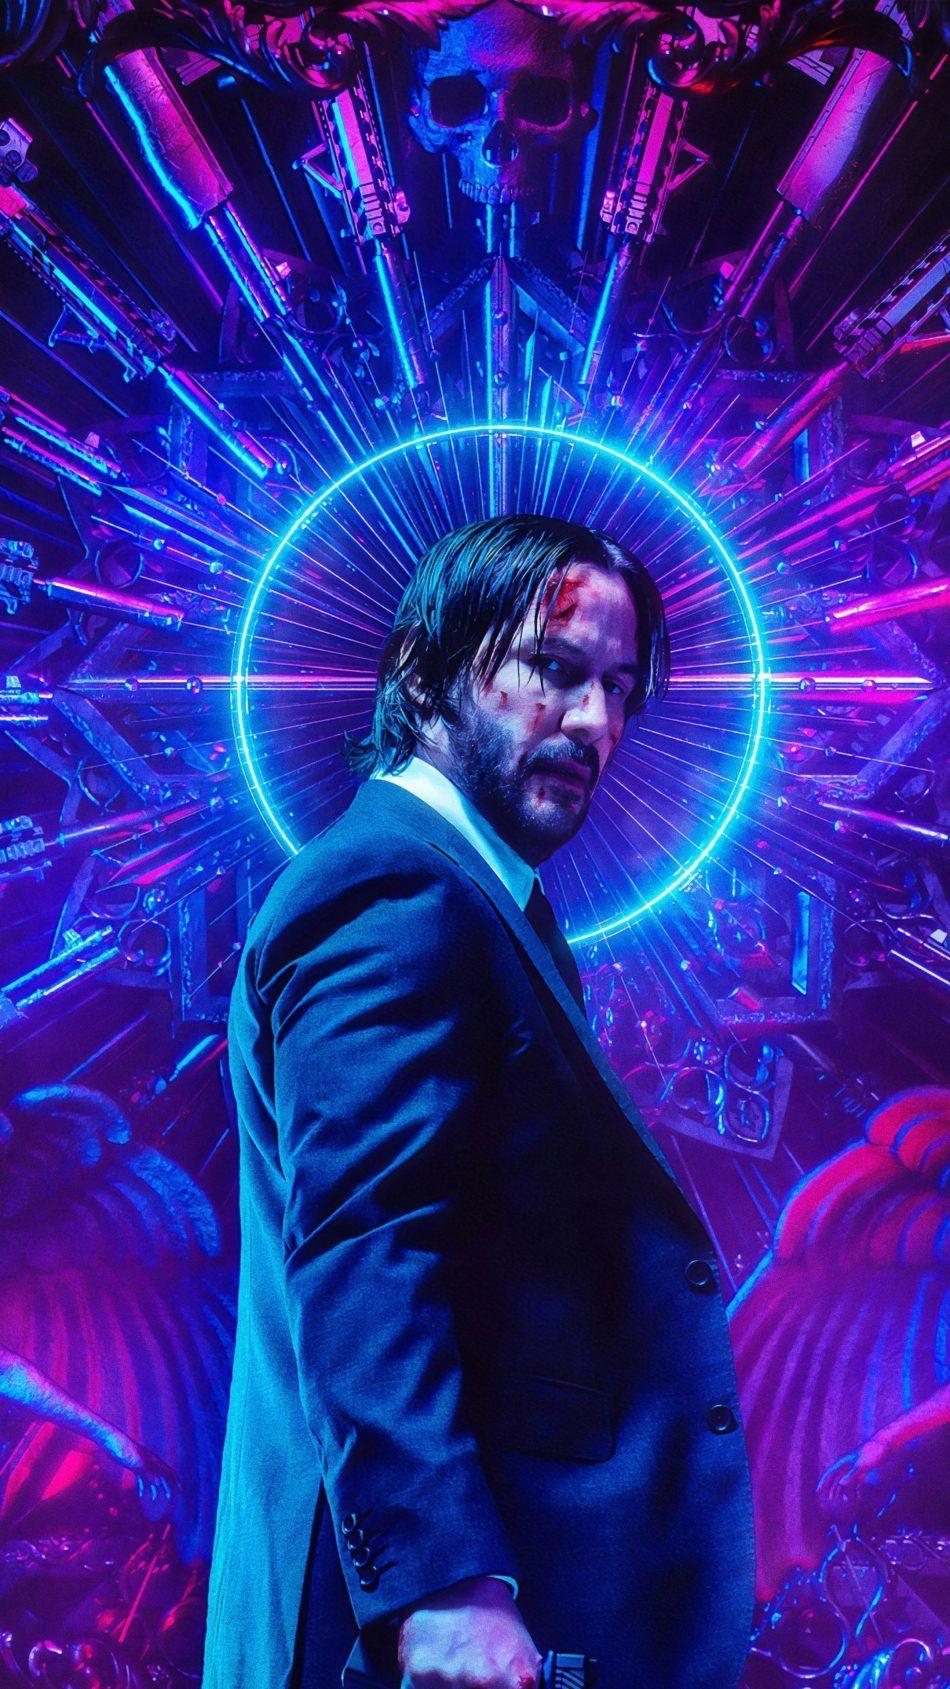 Keanu Reeves Neon John Wick Chapter 3 Parabellum 4k Ultra Hd Mobile Wallpaper Watch Link Click On Image Keanu Reeves Klasik Filmler Poster